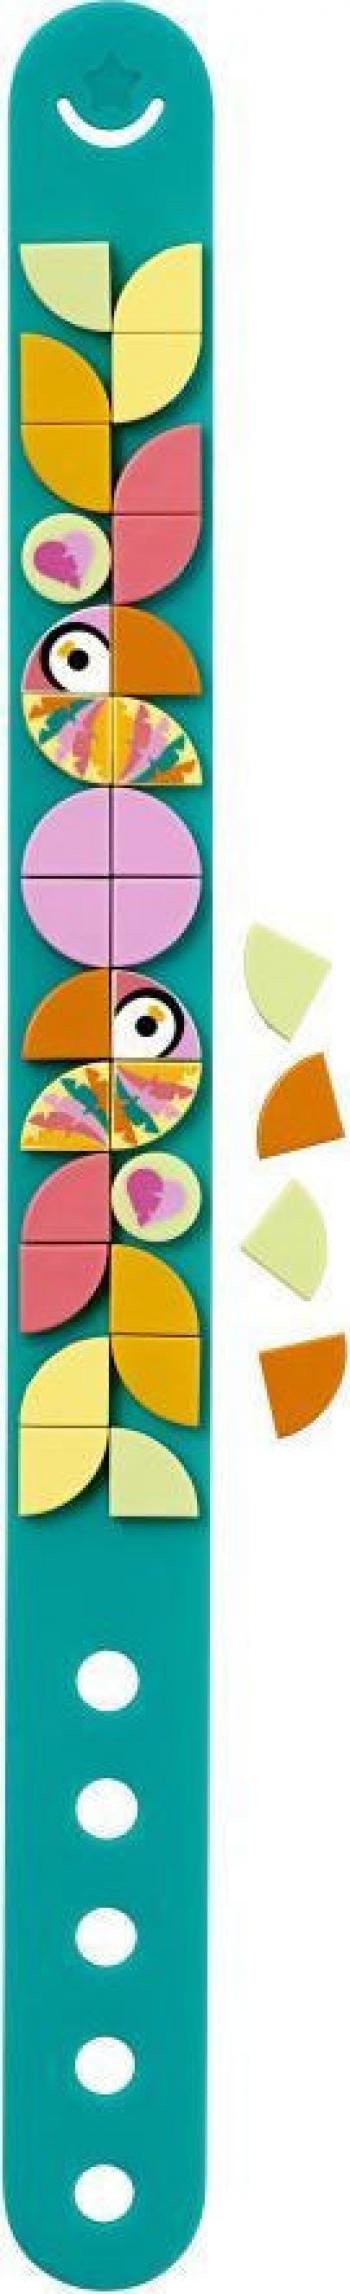 Lego Dots: Love Birds Bracelet 41912